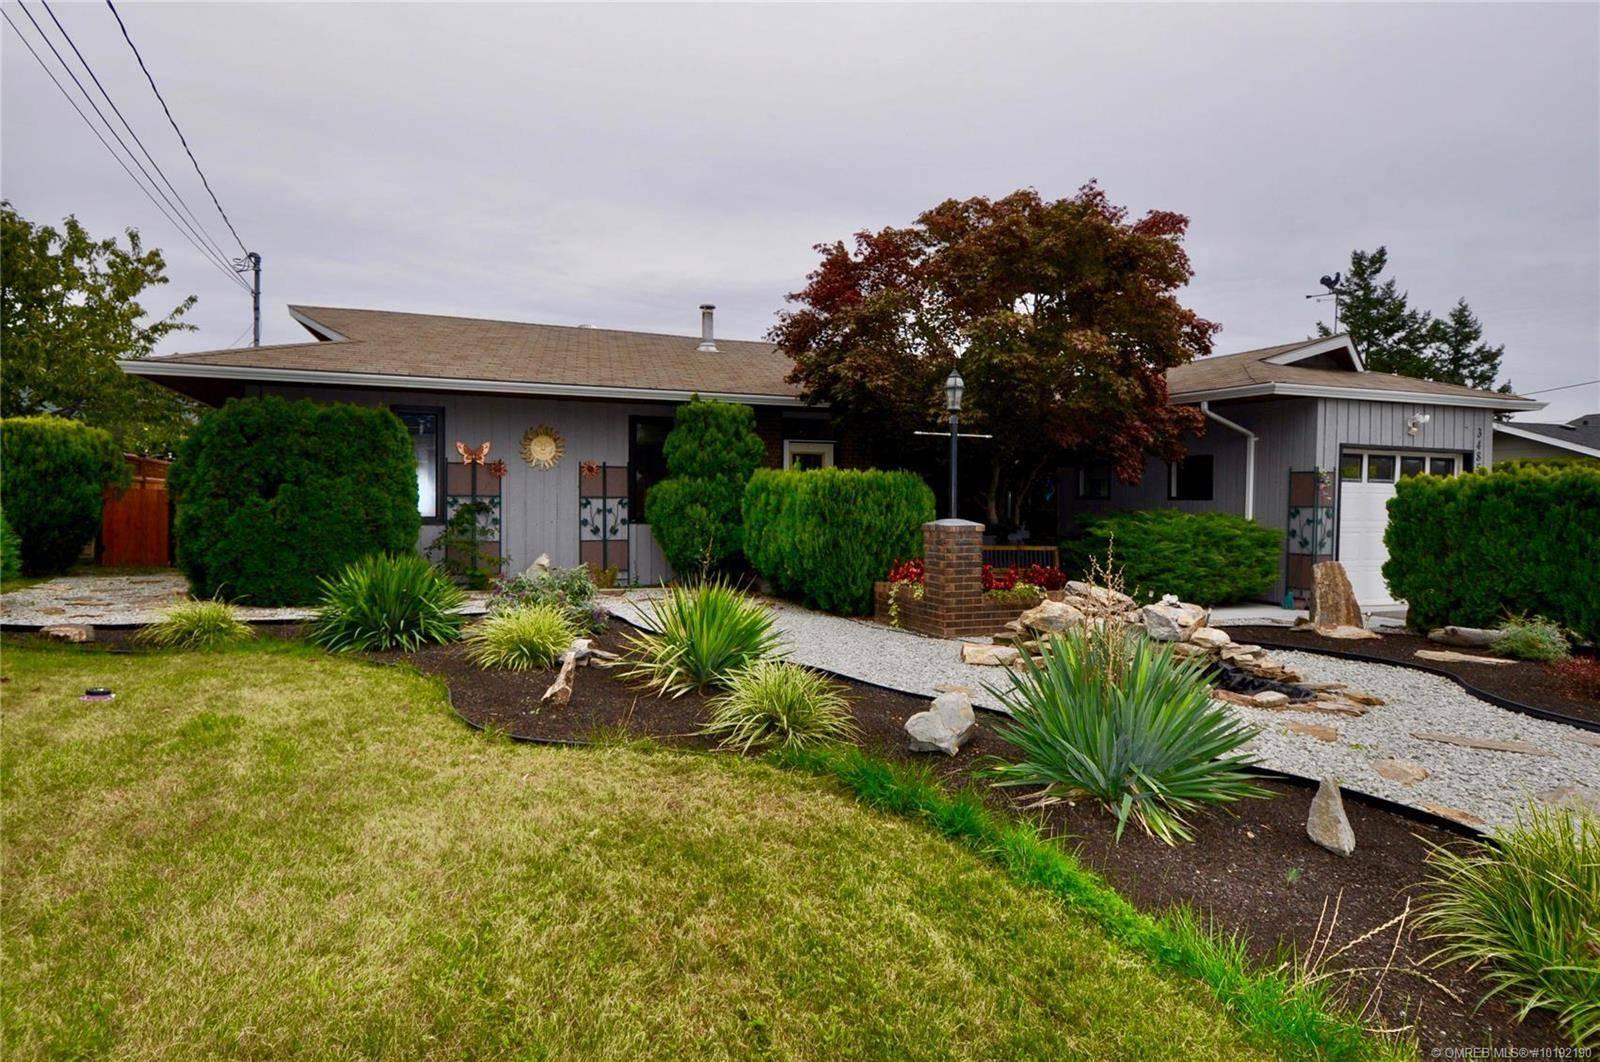 House for sale at 3485 Dunbarton Rd West Kelowna British Columbia - MLS: 10192190